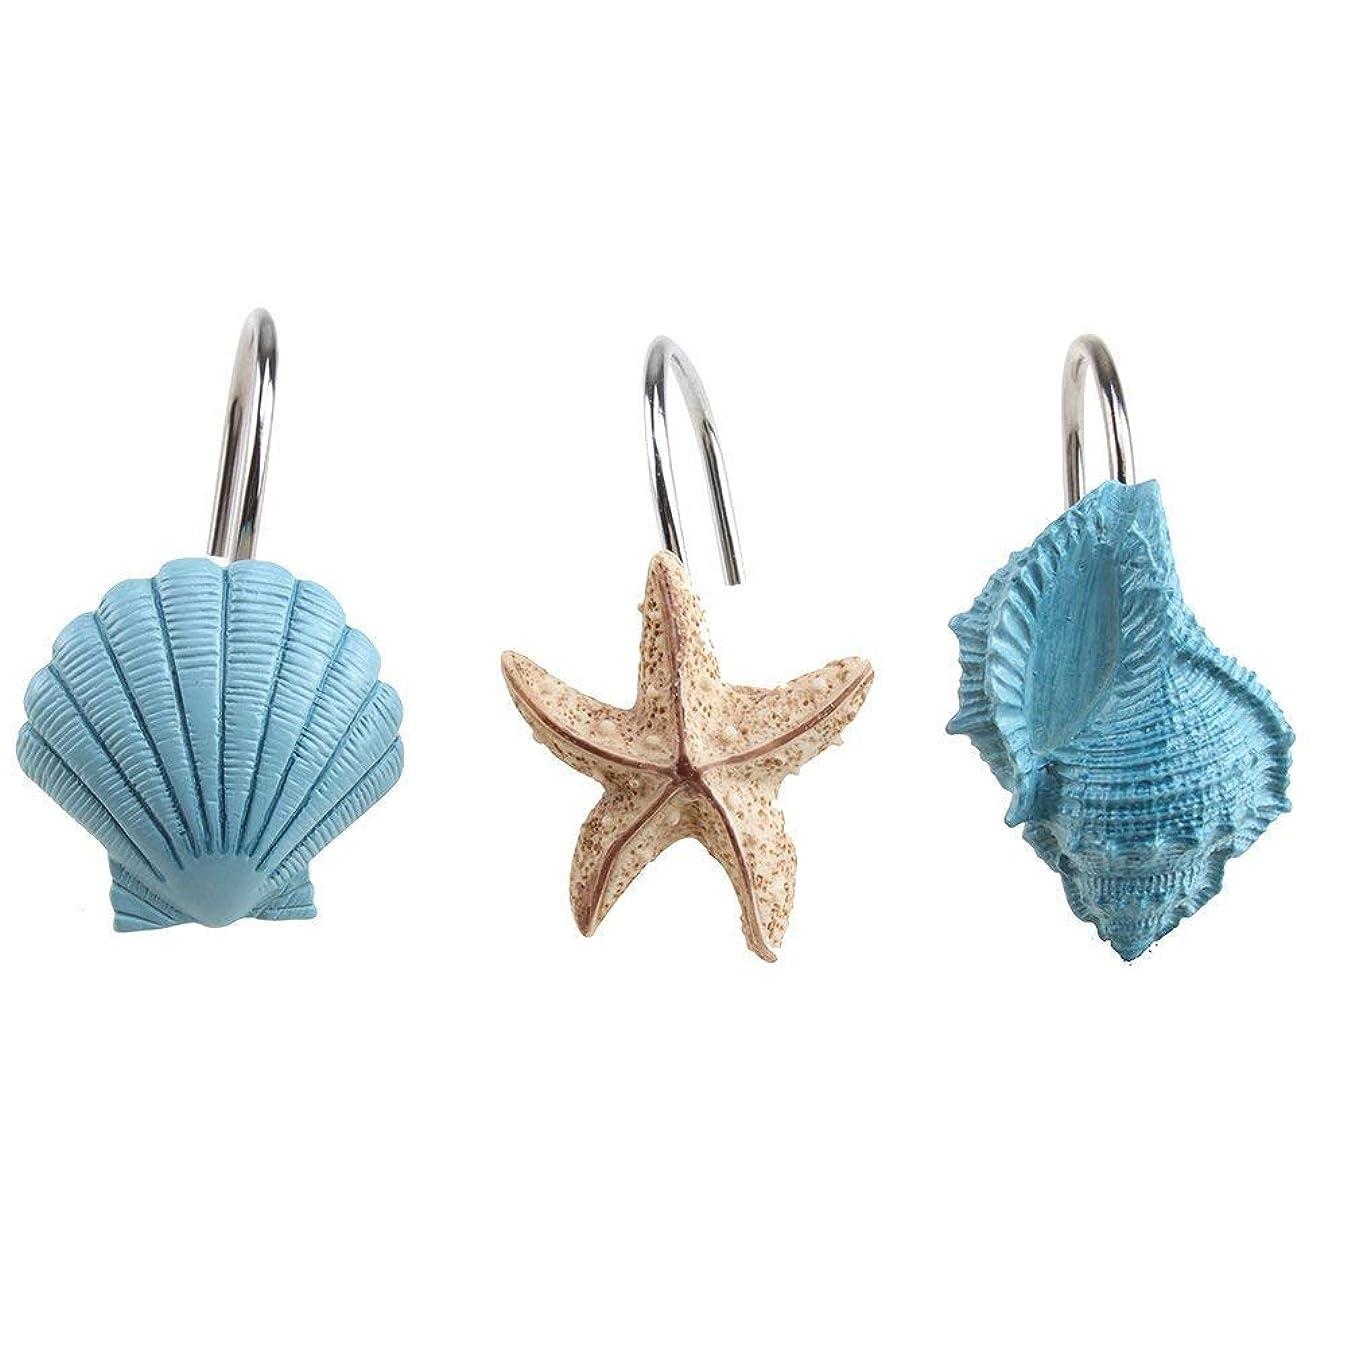 AGPtek? 12 PCS Fashion Decorative Home Bathroom Seashell Shower Curtain Hooks (Seashell: Blue; Starfish: Tan; Conch: Blue)